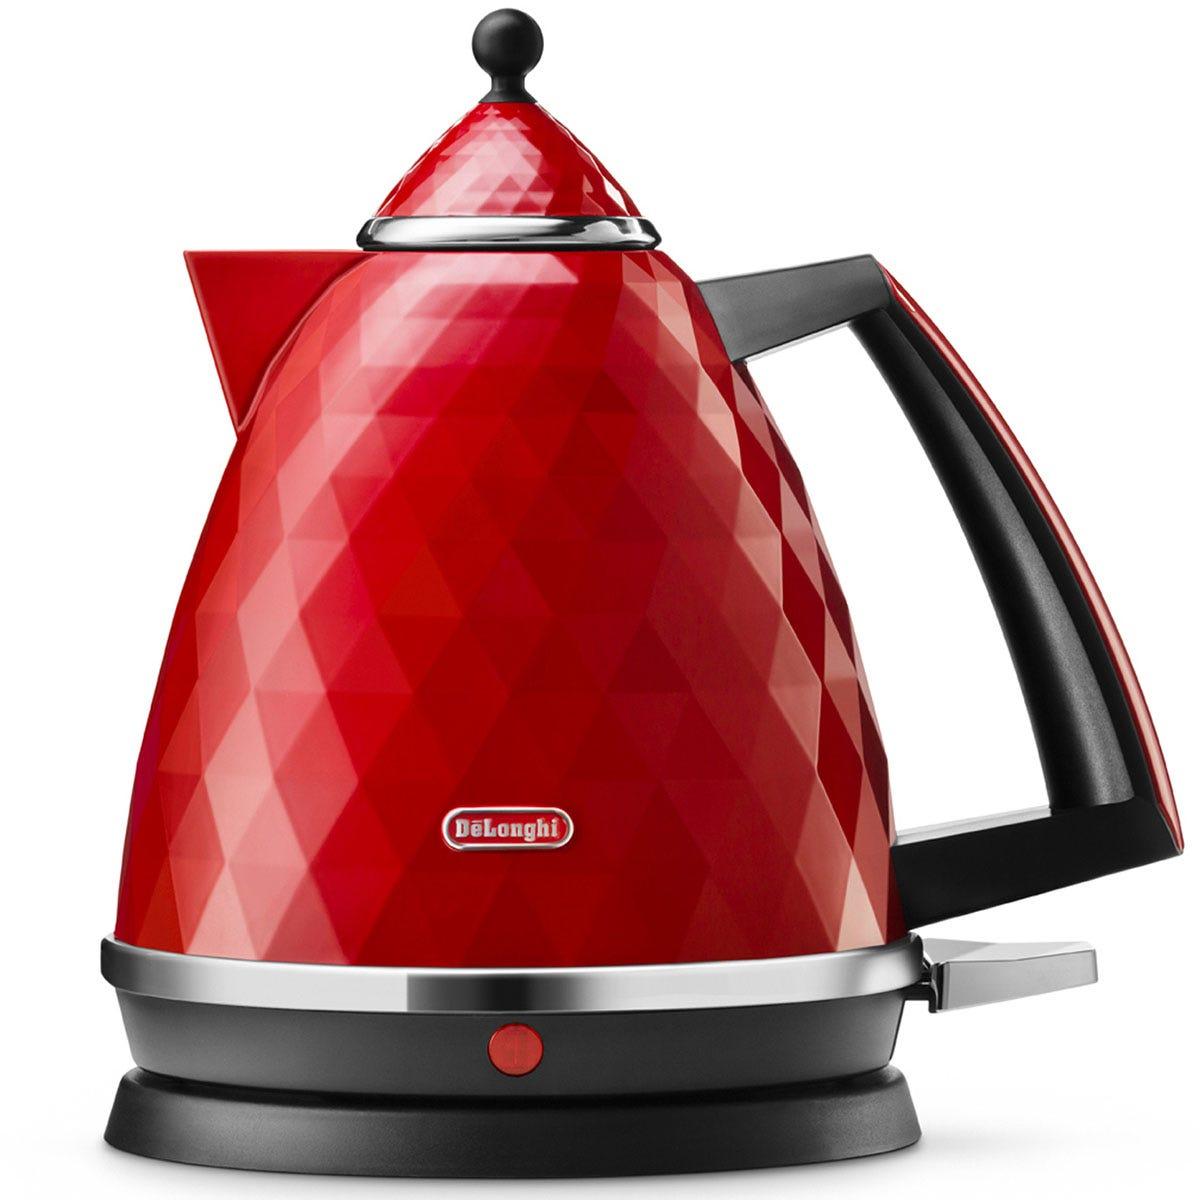 De'Longhi DeLonghi KBJ3001R Brilliante 1.7L 2000W Kettle - Red